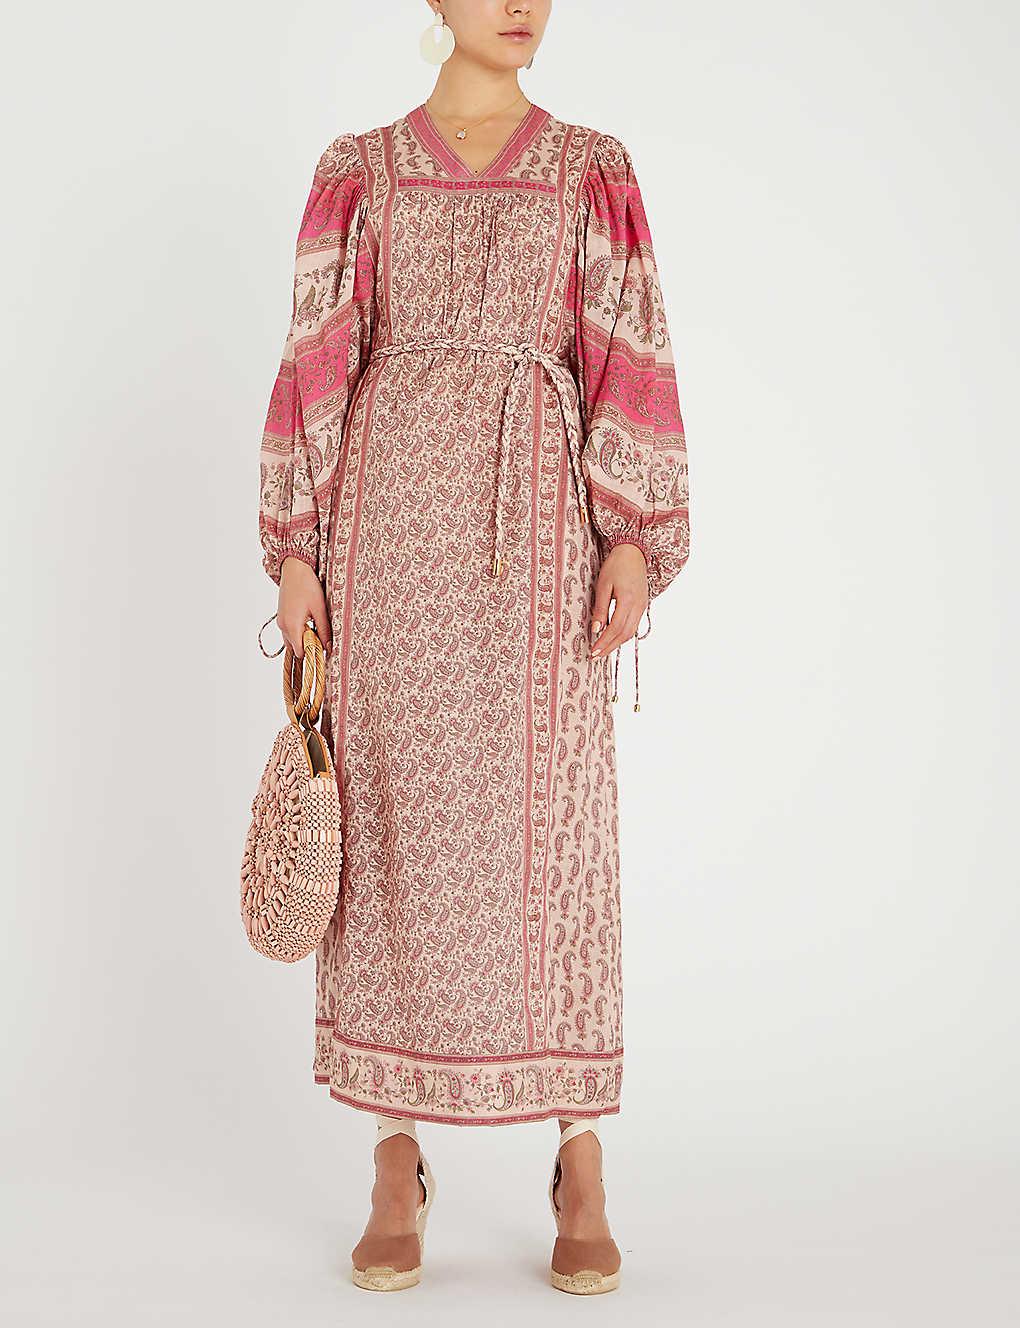 7faa37cb0041 ... Juniper Rioting printed cotton-voile maxi dress - Cream paisley ...